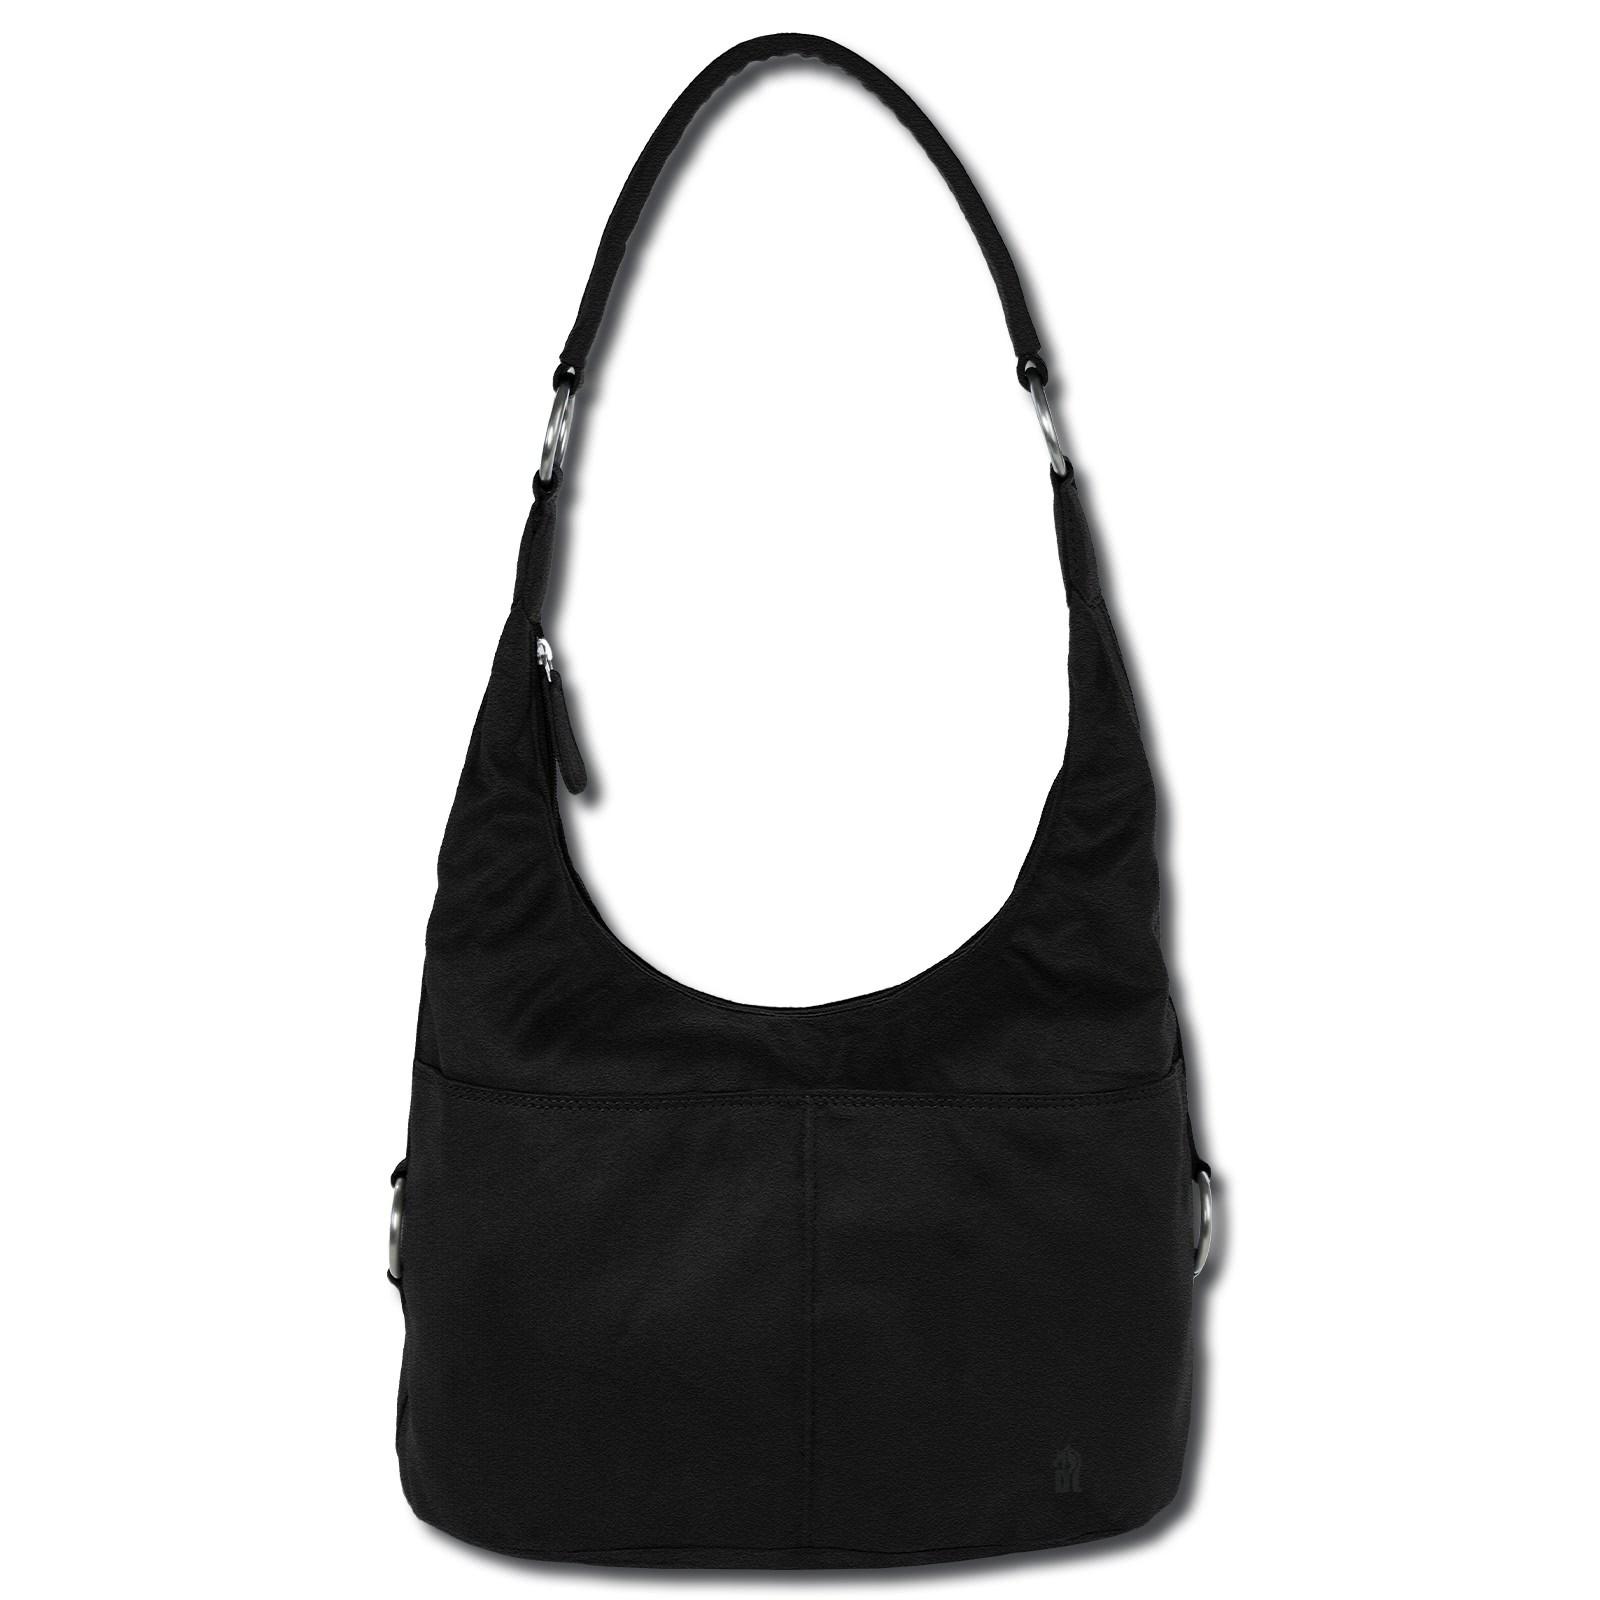 Beuteltasche Kunstleder schwarz Damen Hobo Bag Handtasche DrachenLeder OTS100S